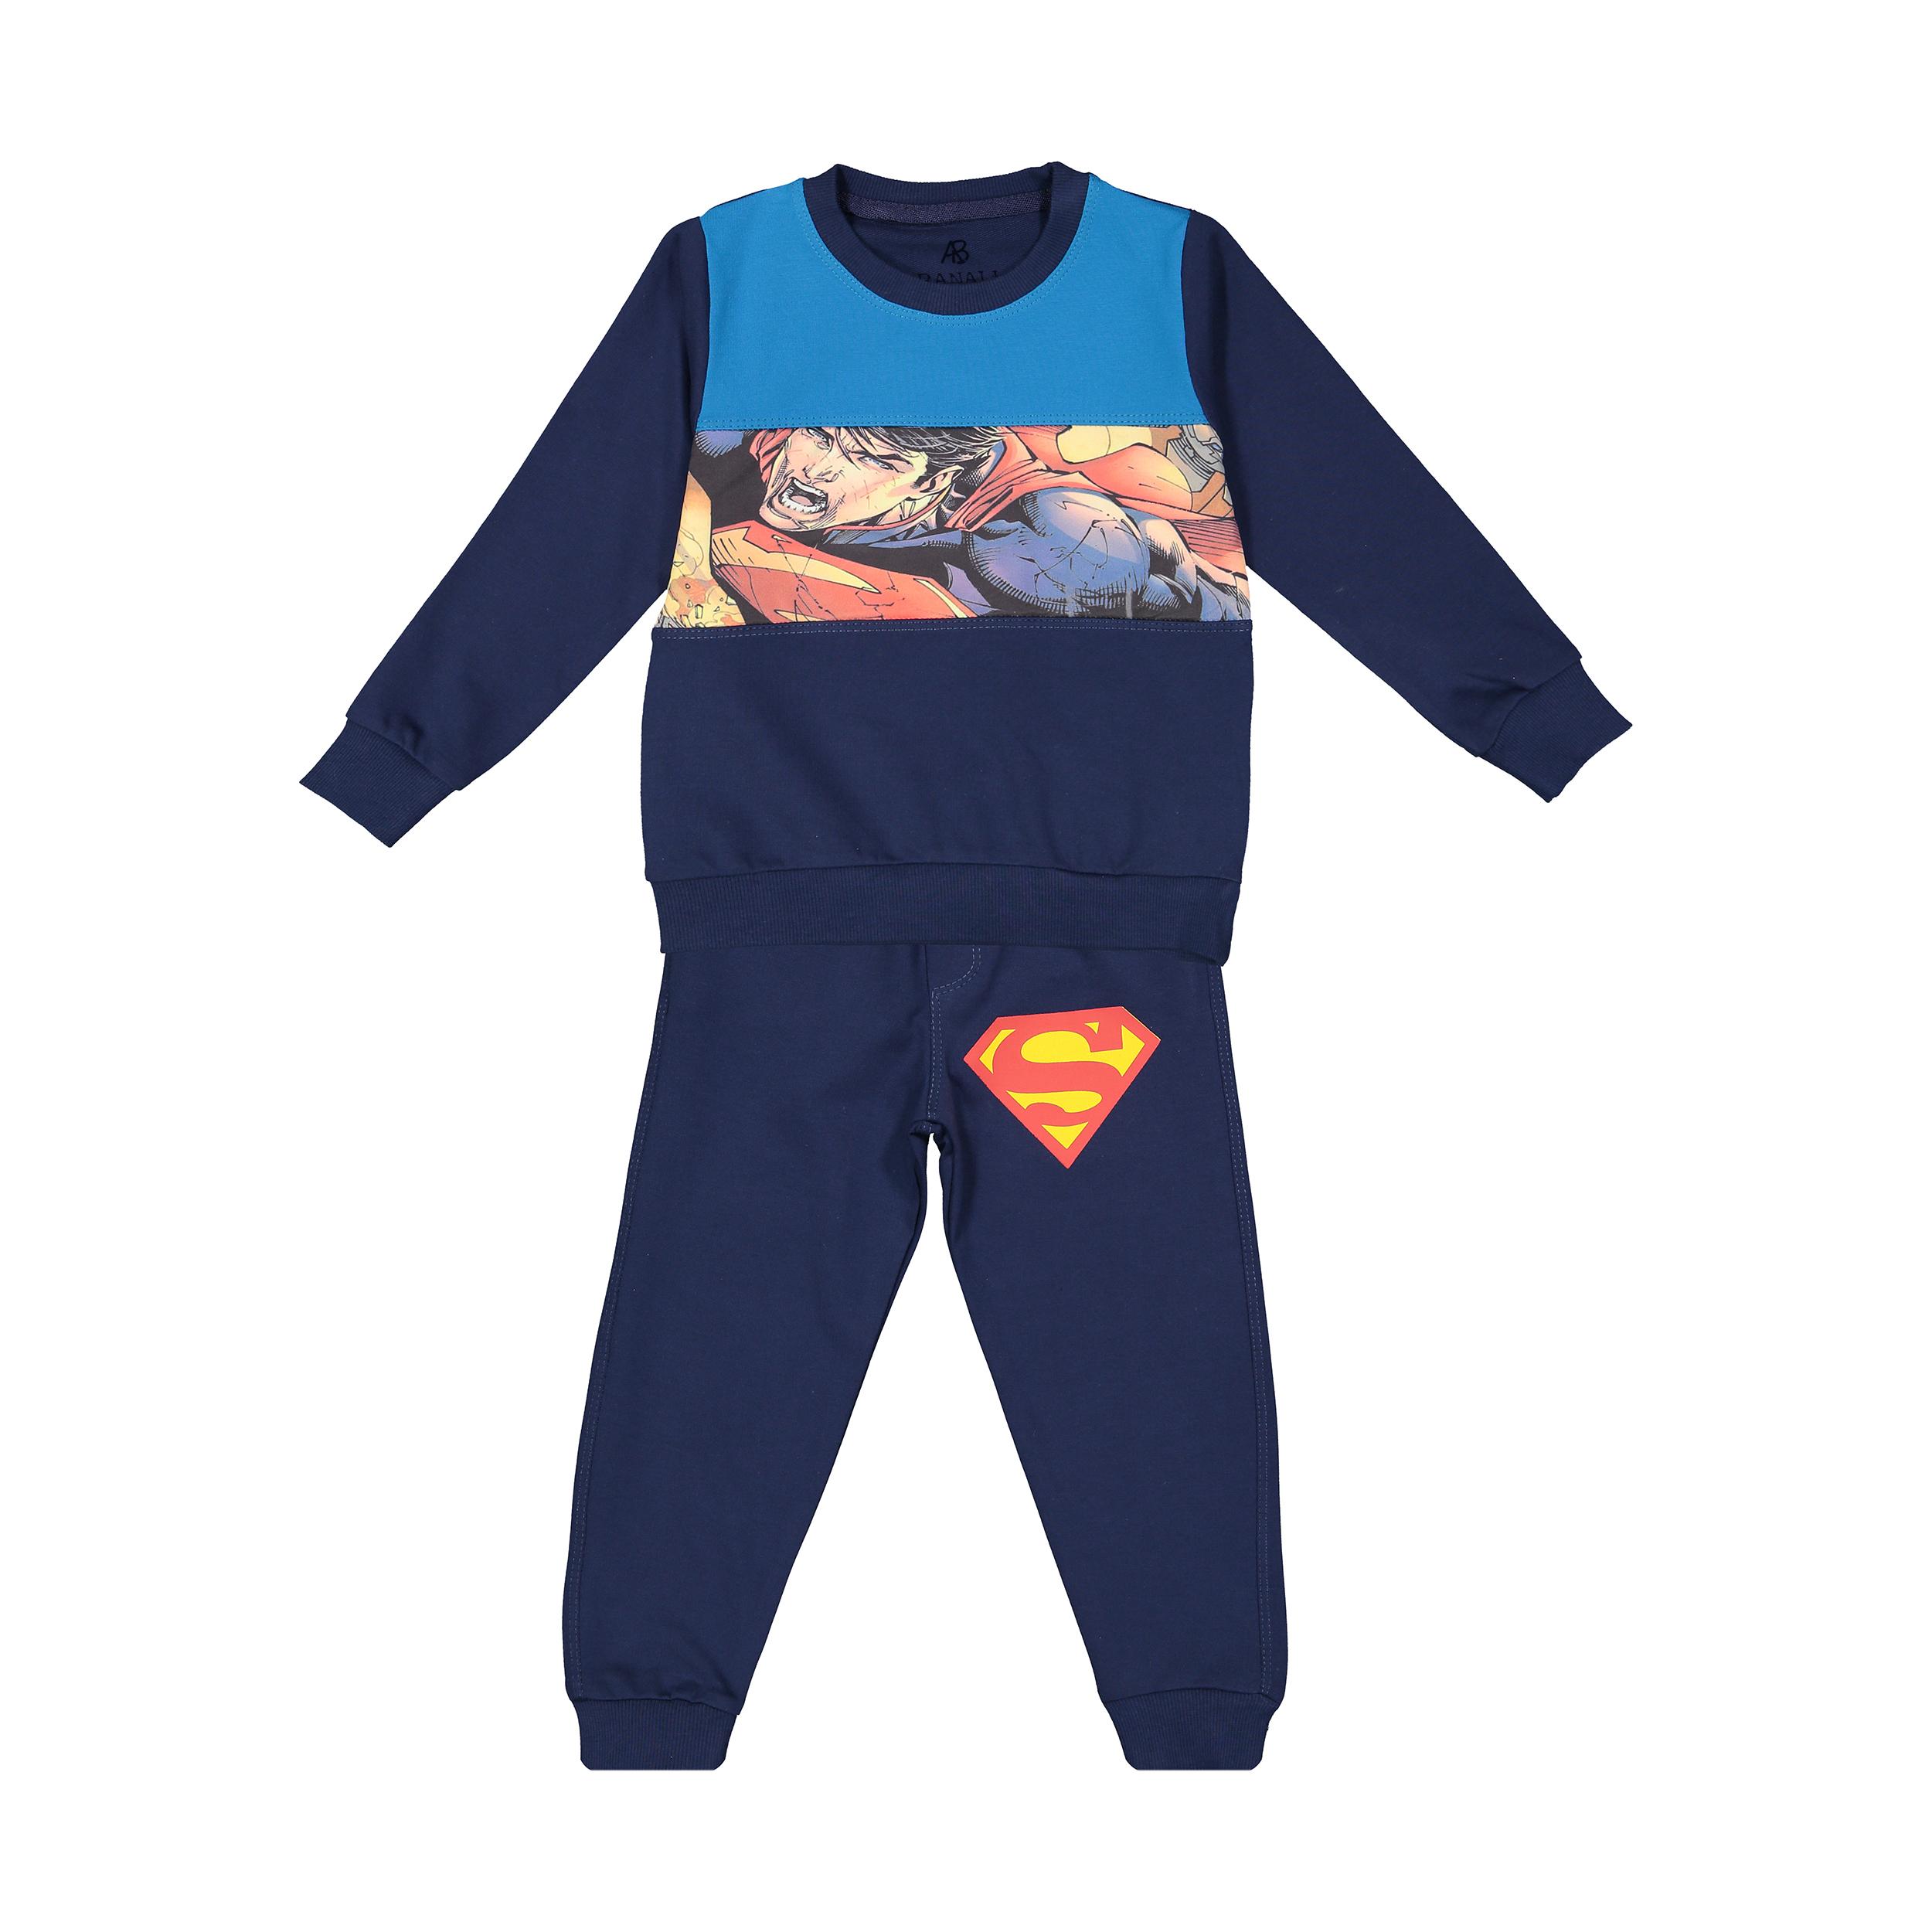 خرید                     ست سویشرت و شلوار پسرانه بانالی طرح سوپرمن کد ۱۶۹۱